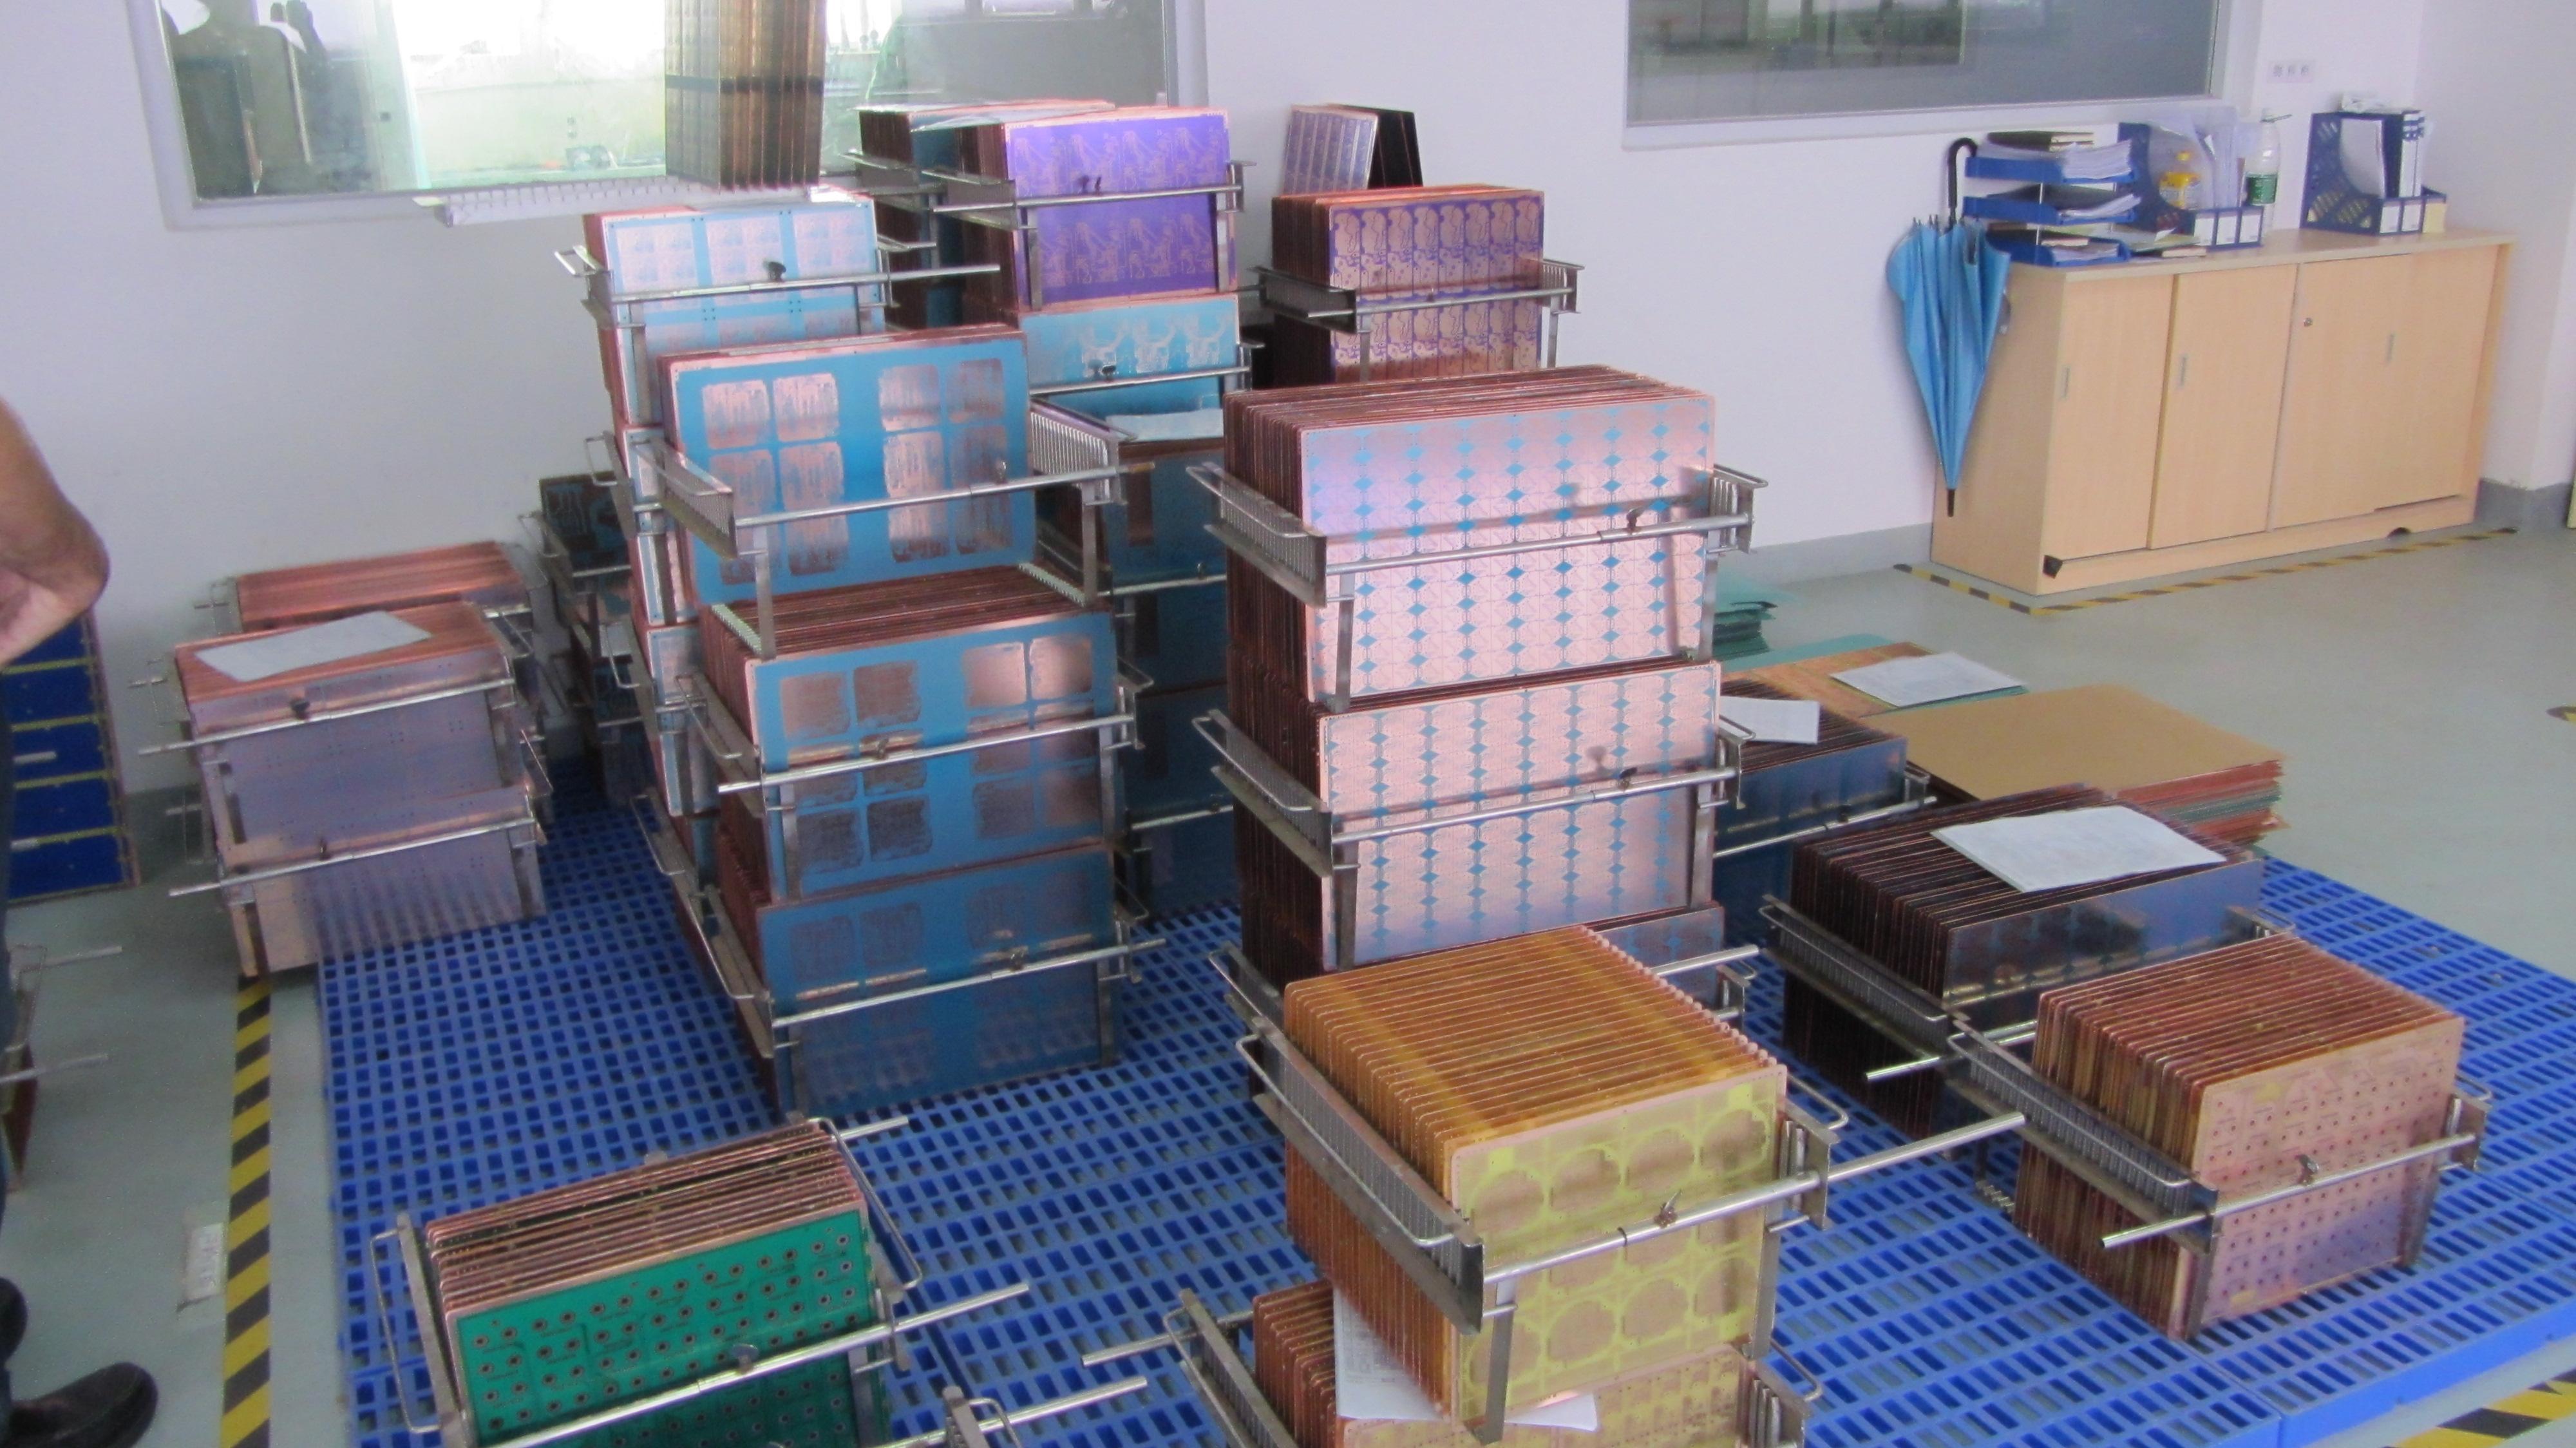 Fabulous Printer Circuit Board Manufacturing From Natlus Urd Natlus Urd Wiring Cloud Biosomenaidewilluminateatxorg